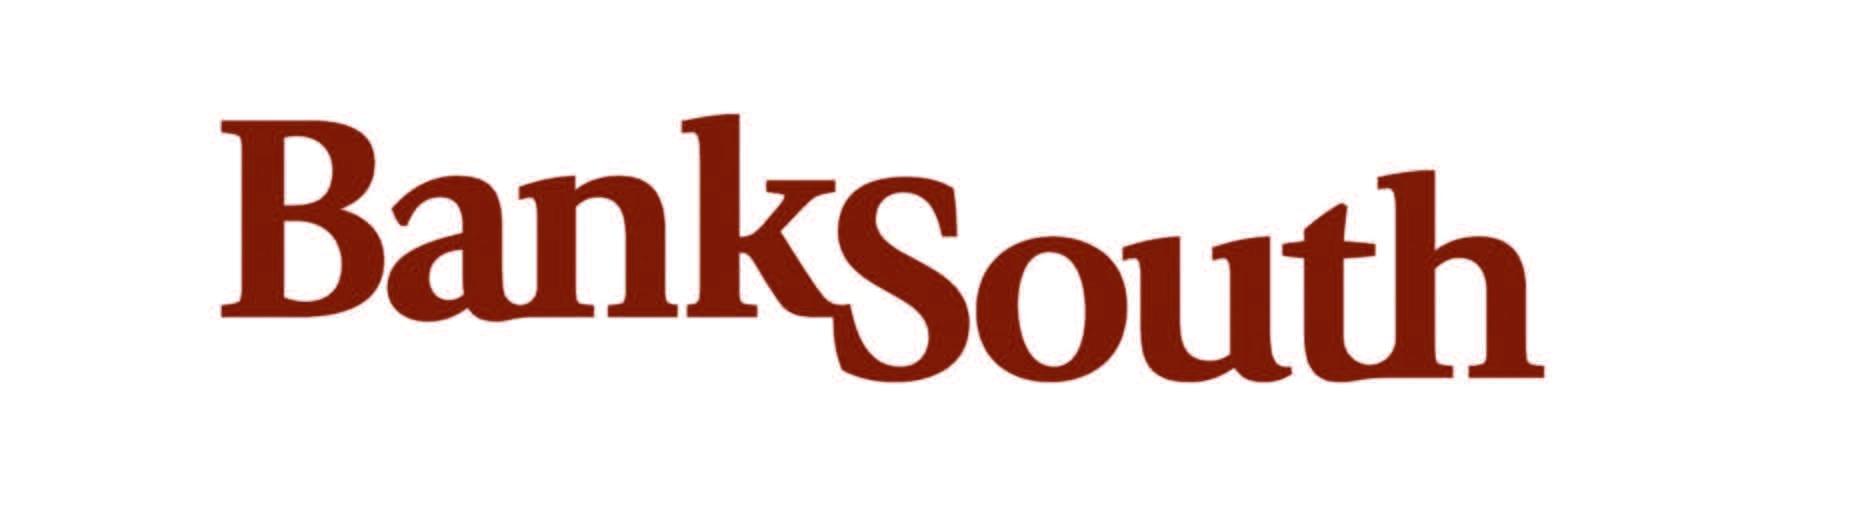 BankSouth 2.jpg